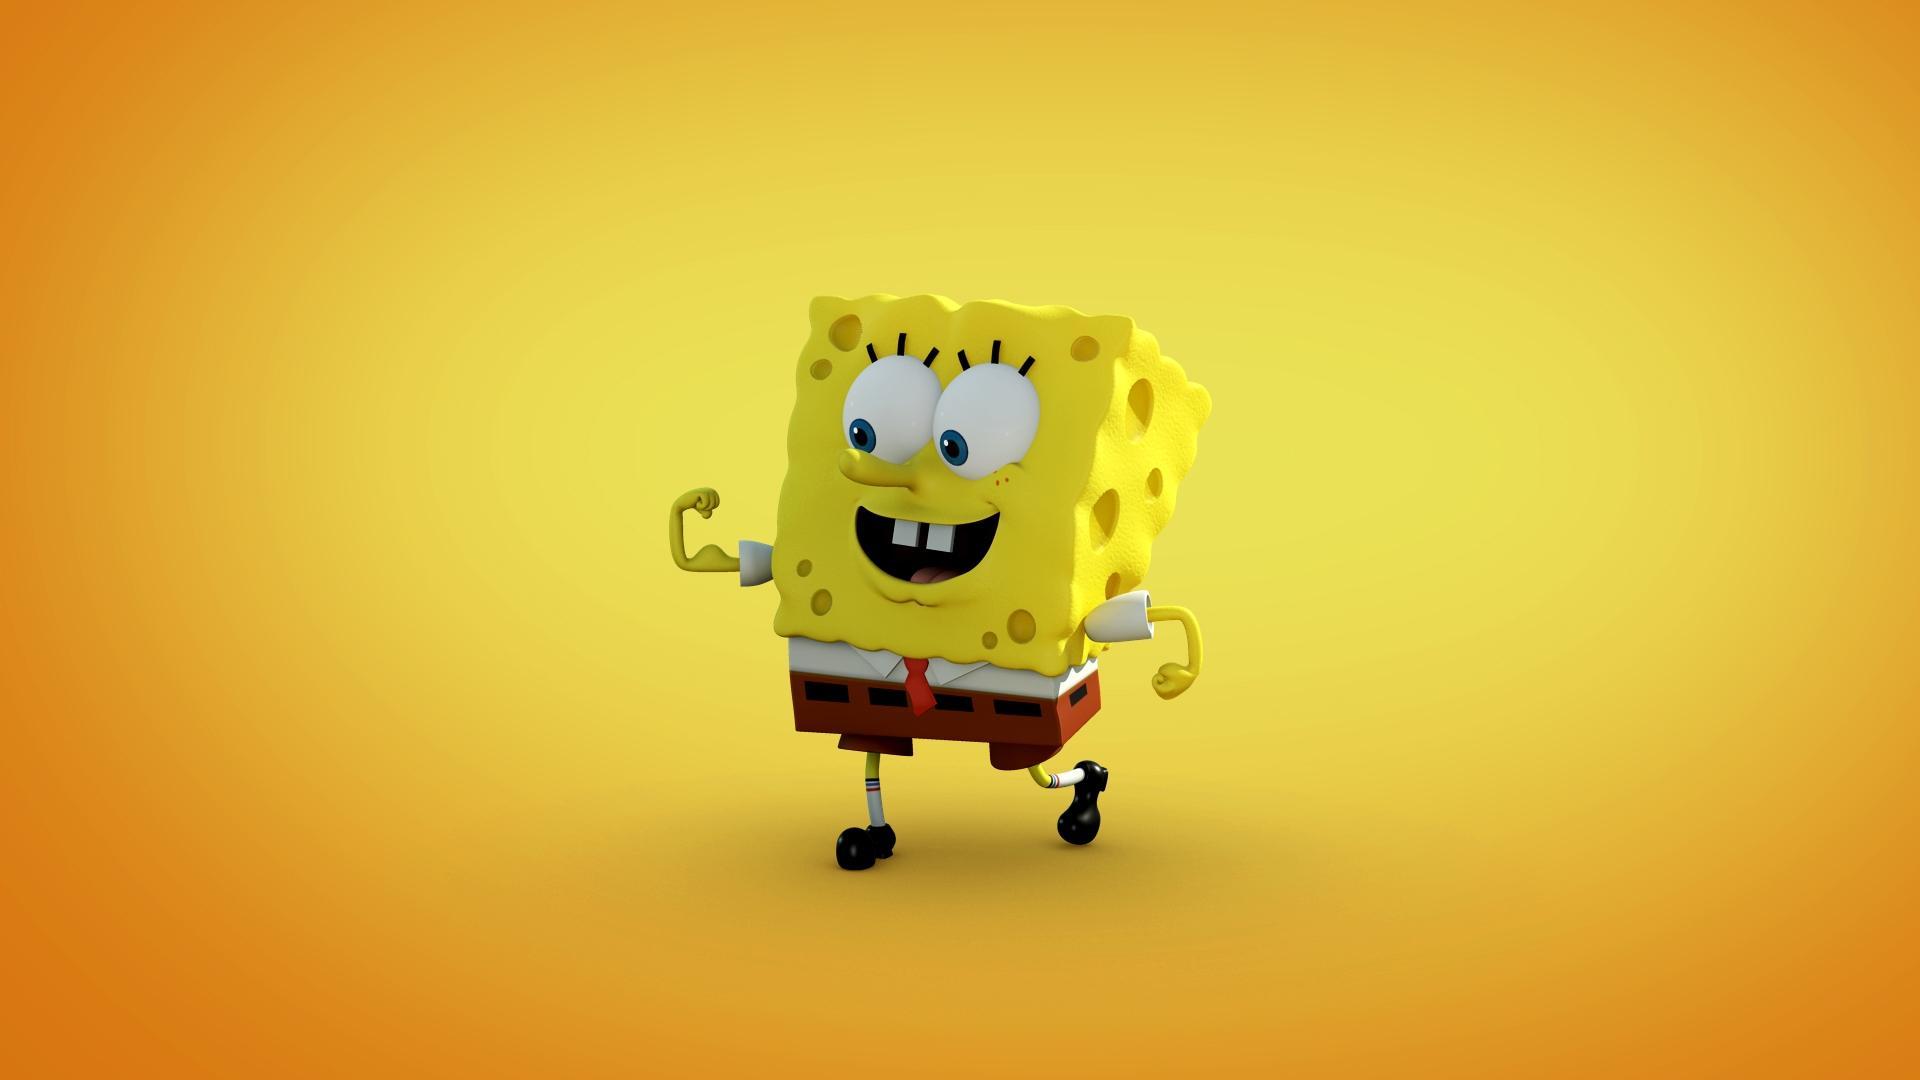 Supreme Spongebob Wallpapers - Wallpaper Cave